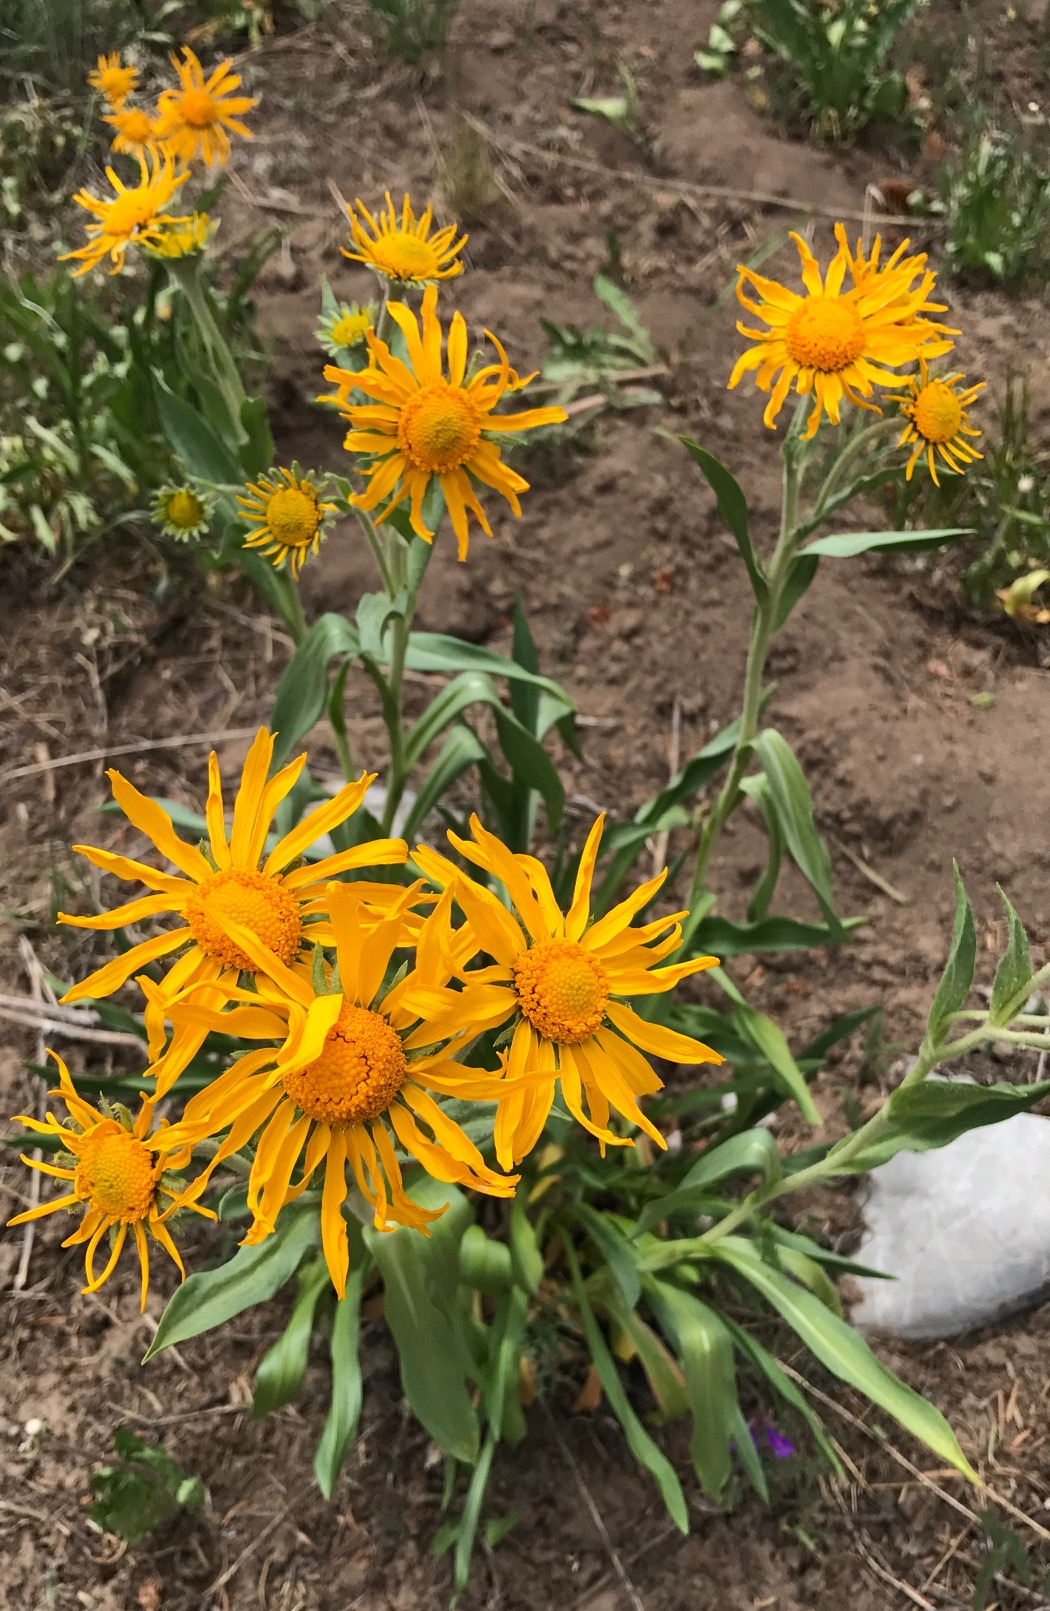 Wildflowers blooming on the Missionary Ridge burn scar. Photo by: Laurel Sebastian